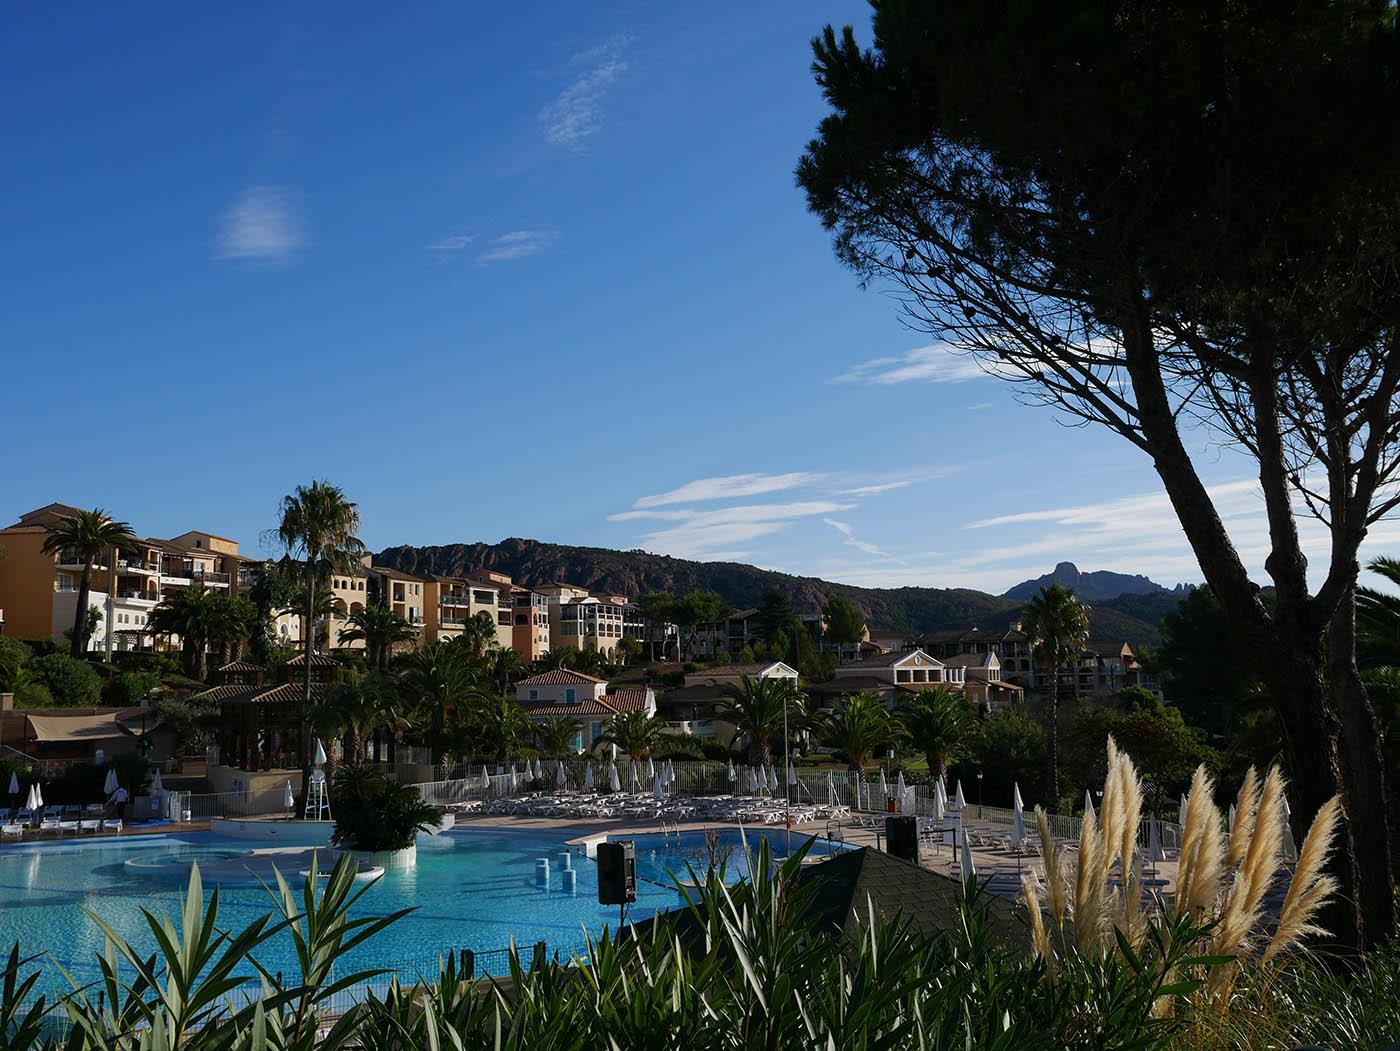 piscine cap esterel pierre et vacances